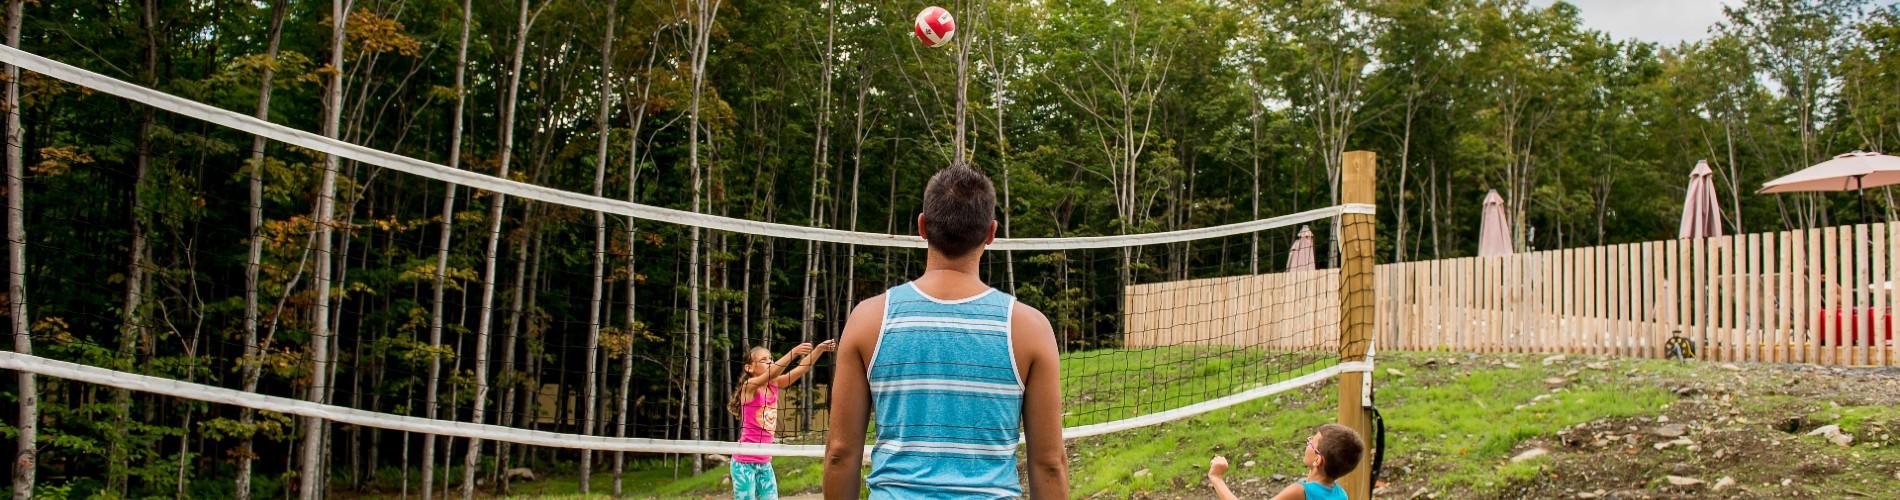 camping-arcachon-activites-services-volley-bandeau